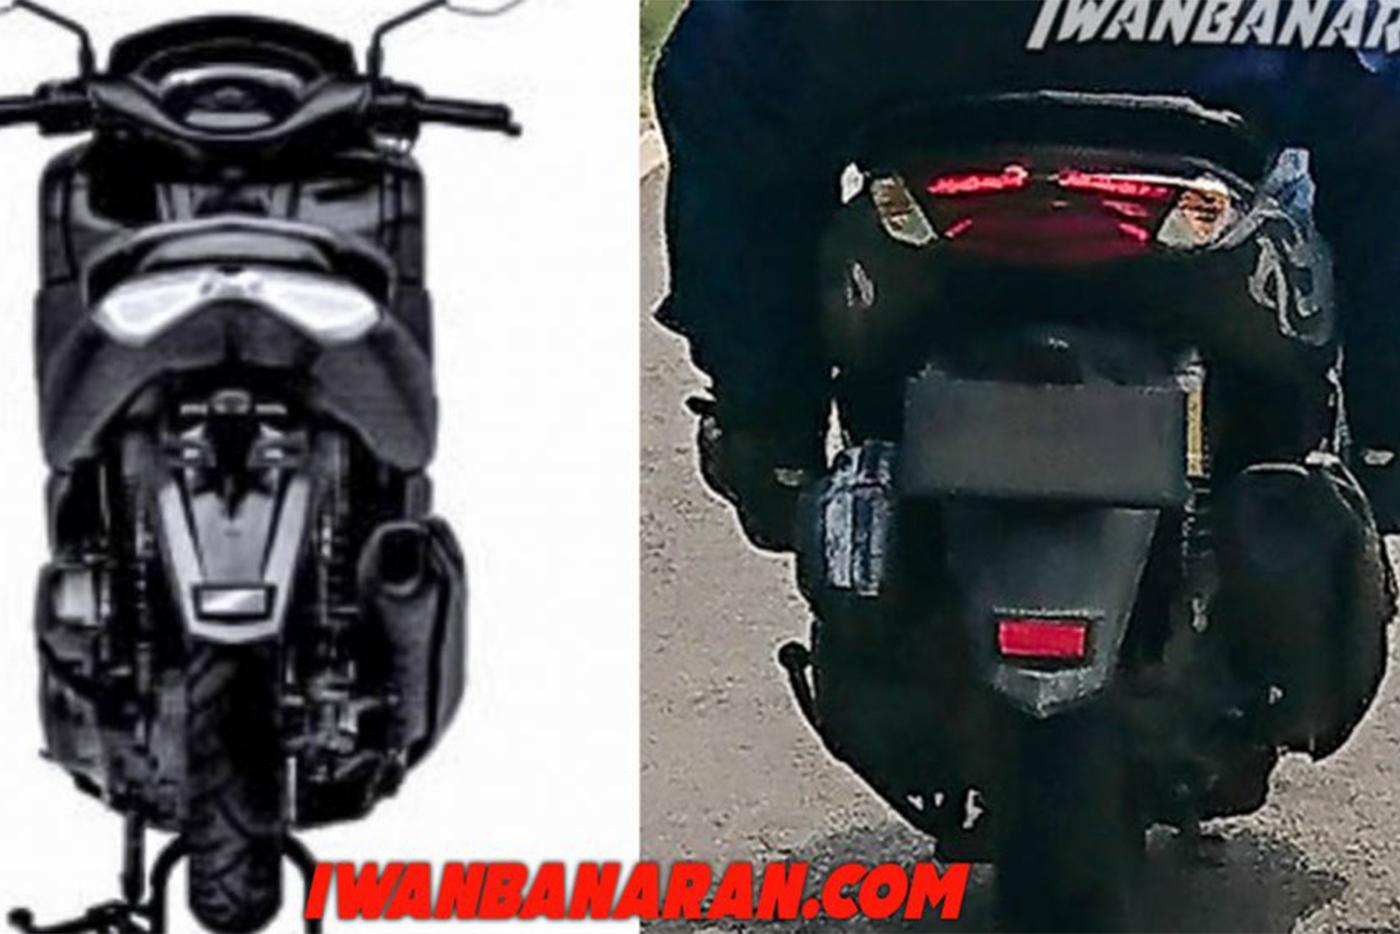 yamaha-nmax-155-update-spyshot-led-tail-lamp-compa-109b.jpg